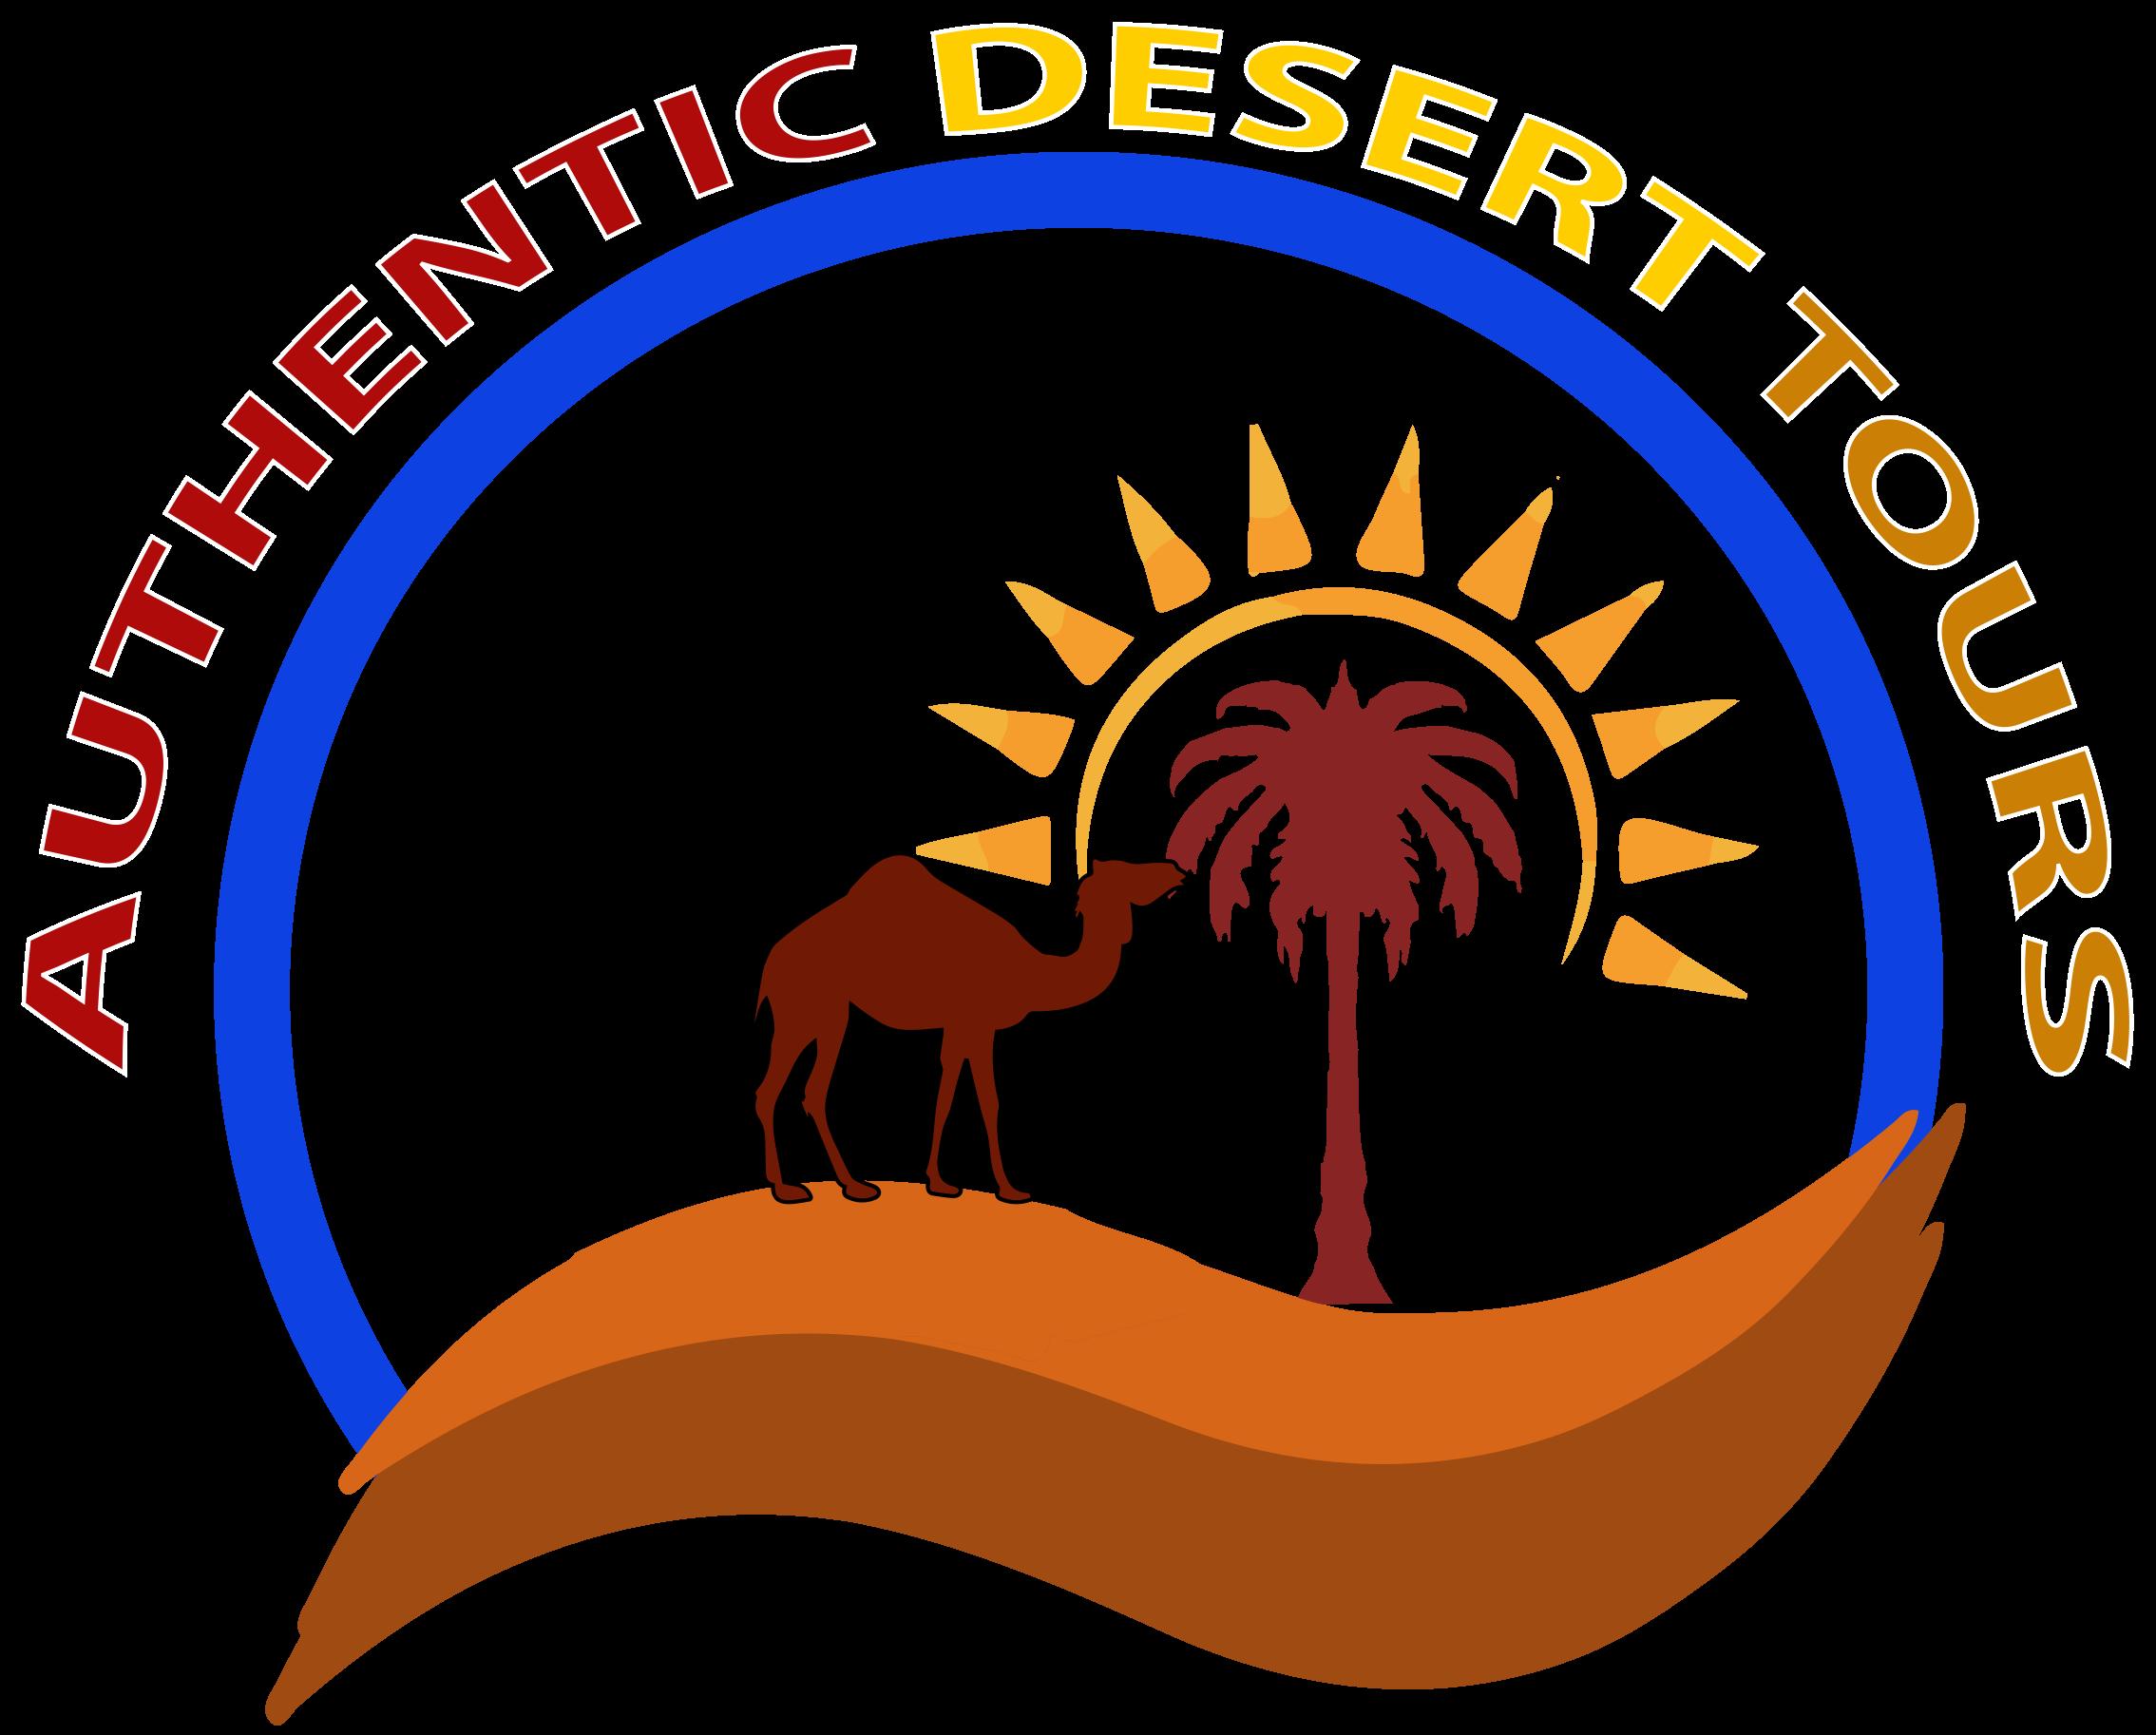 Authentic Desert Tours